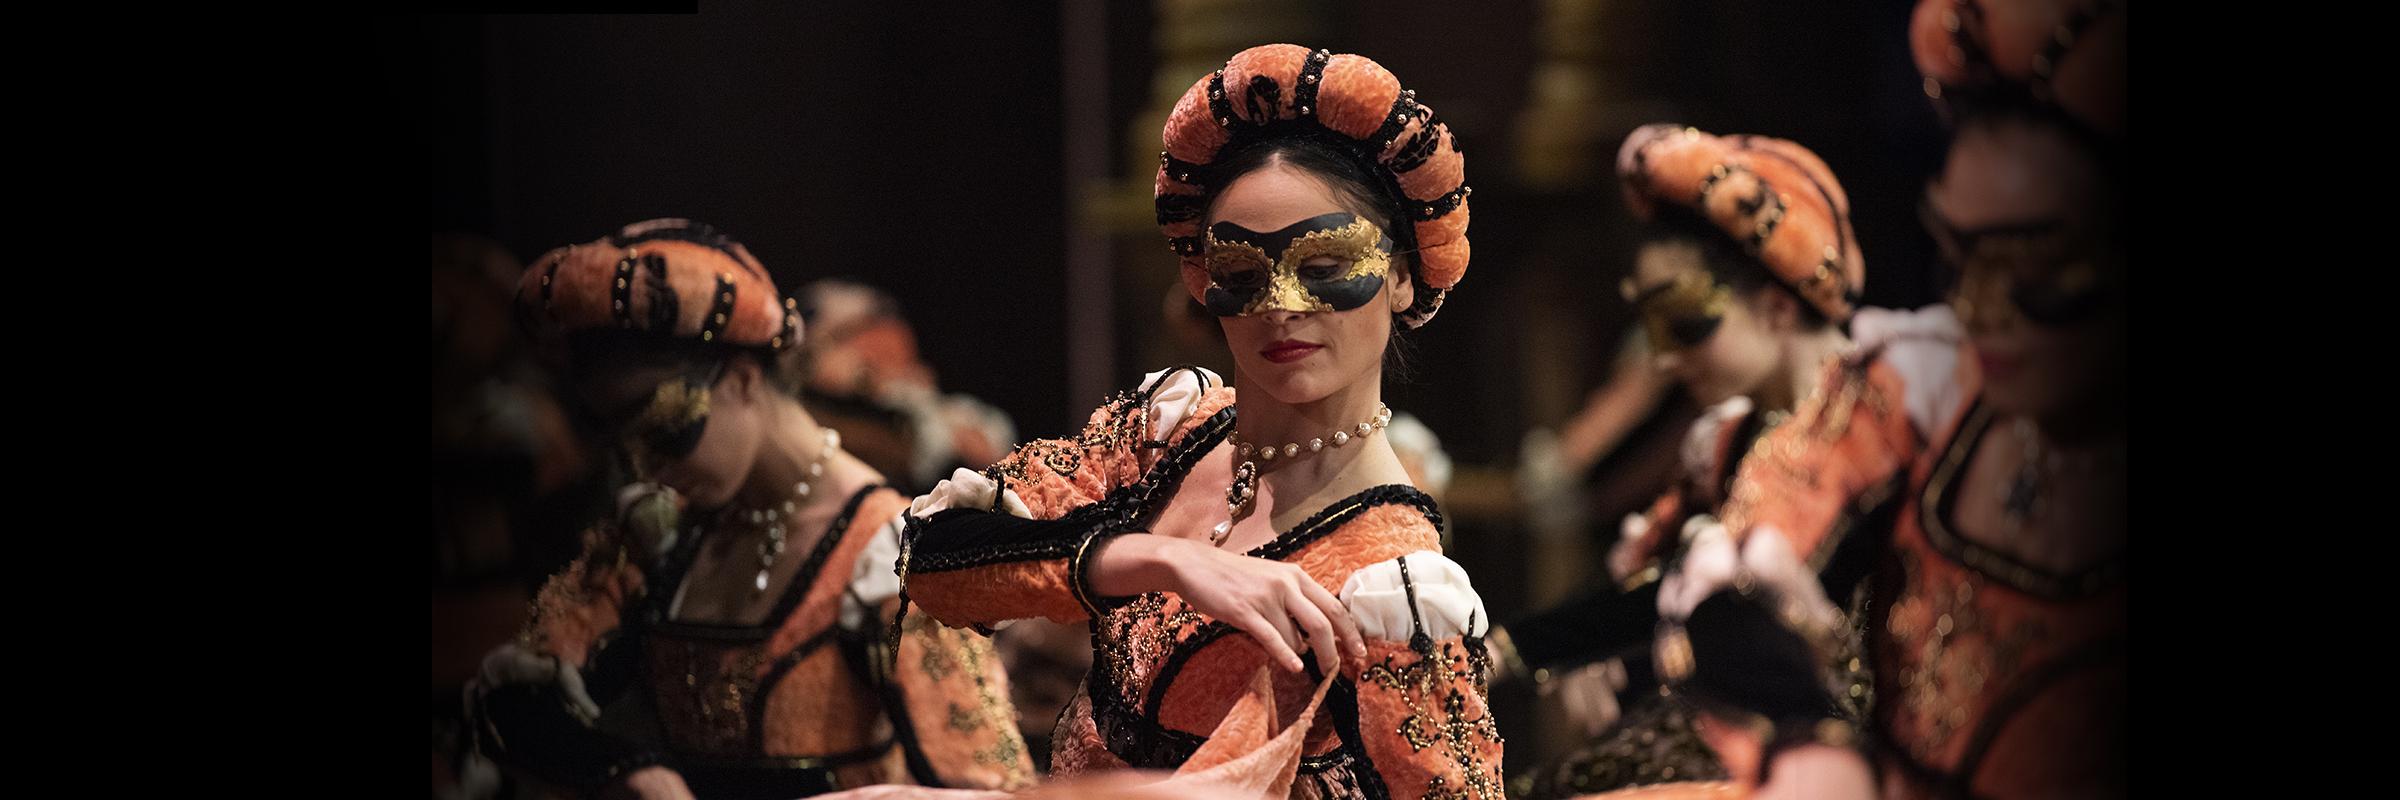 Ludmila Bizalion in Tomasson's Romeo & Juliet // © Erik Tomasson